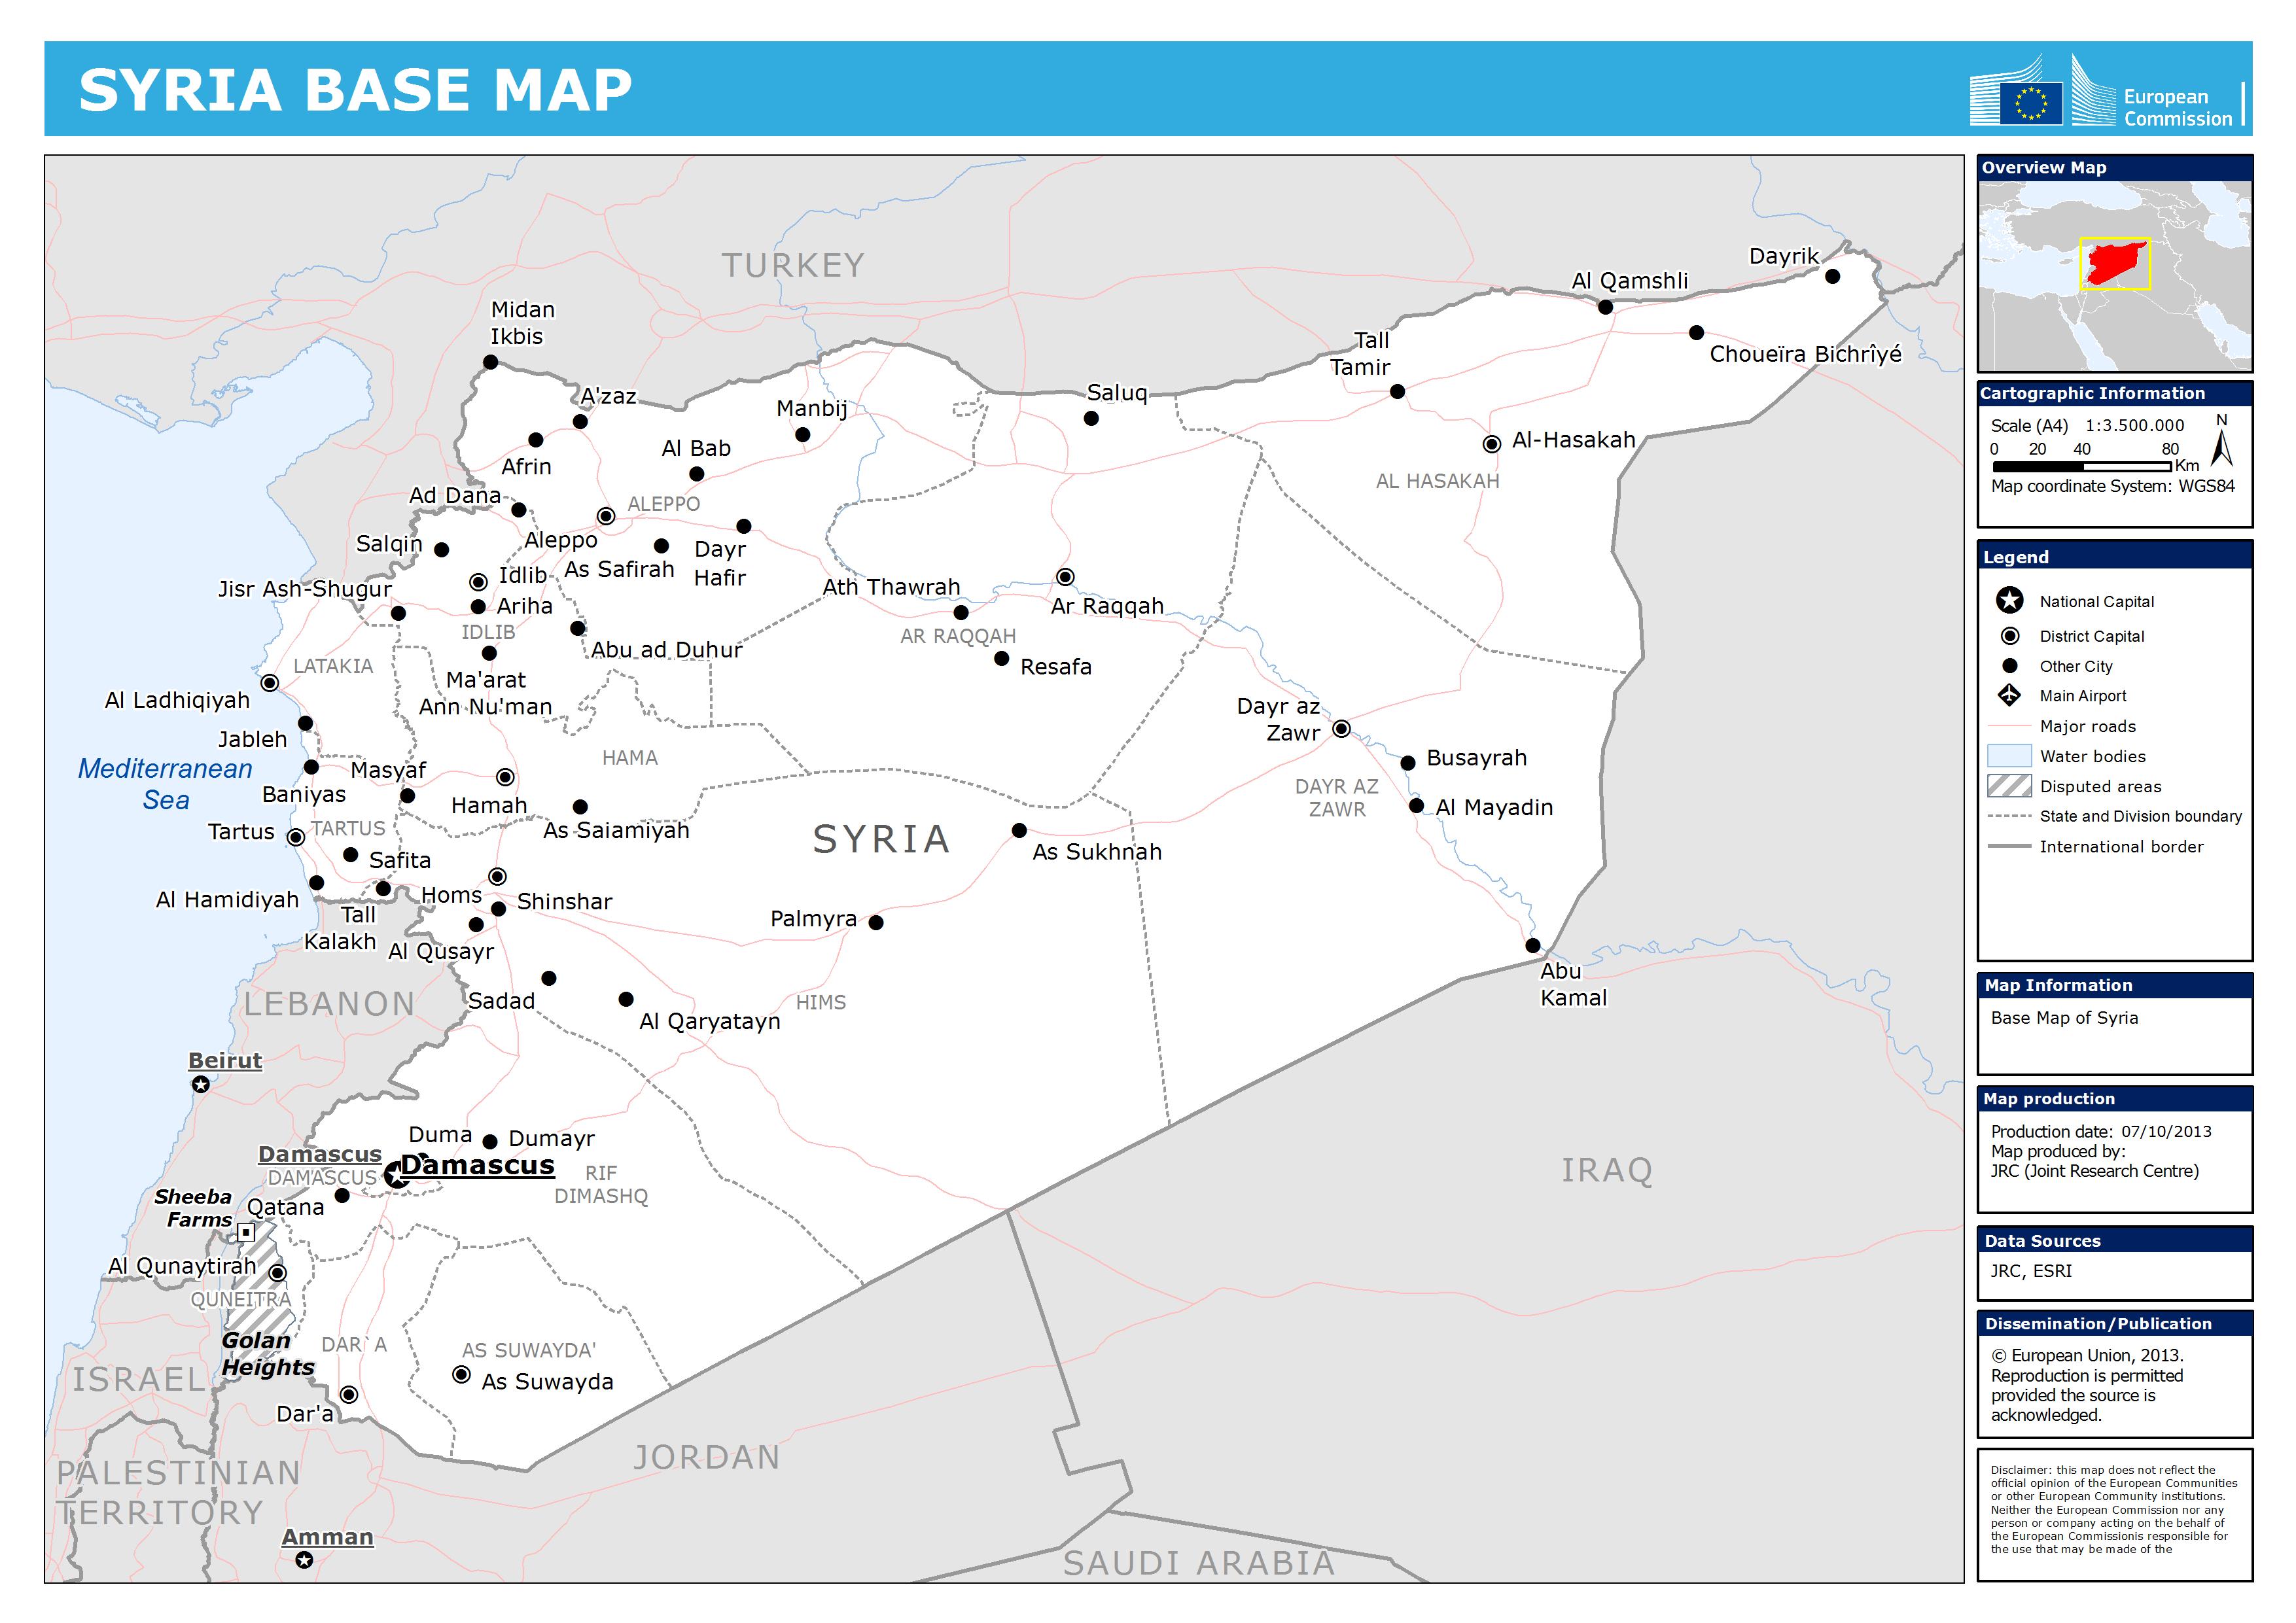 ECHO_Syria_BaseMap_A4_Landscape.png